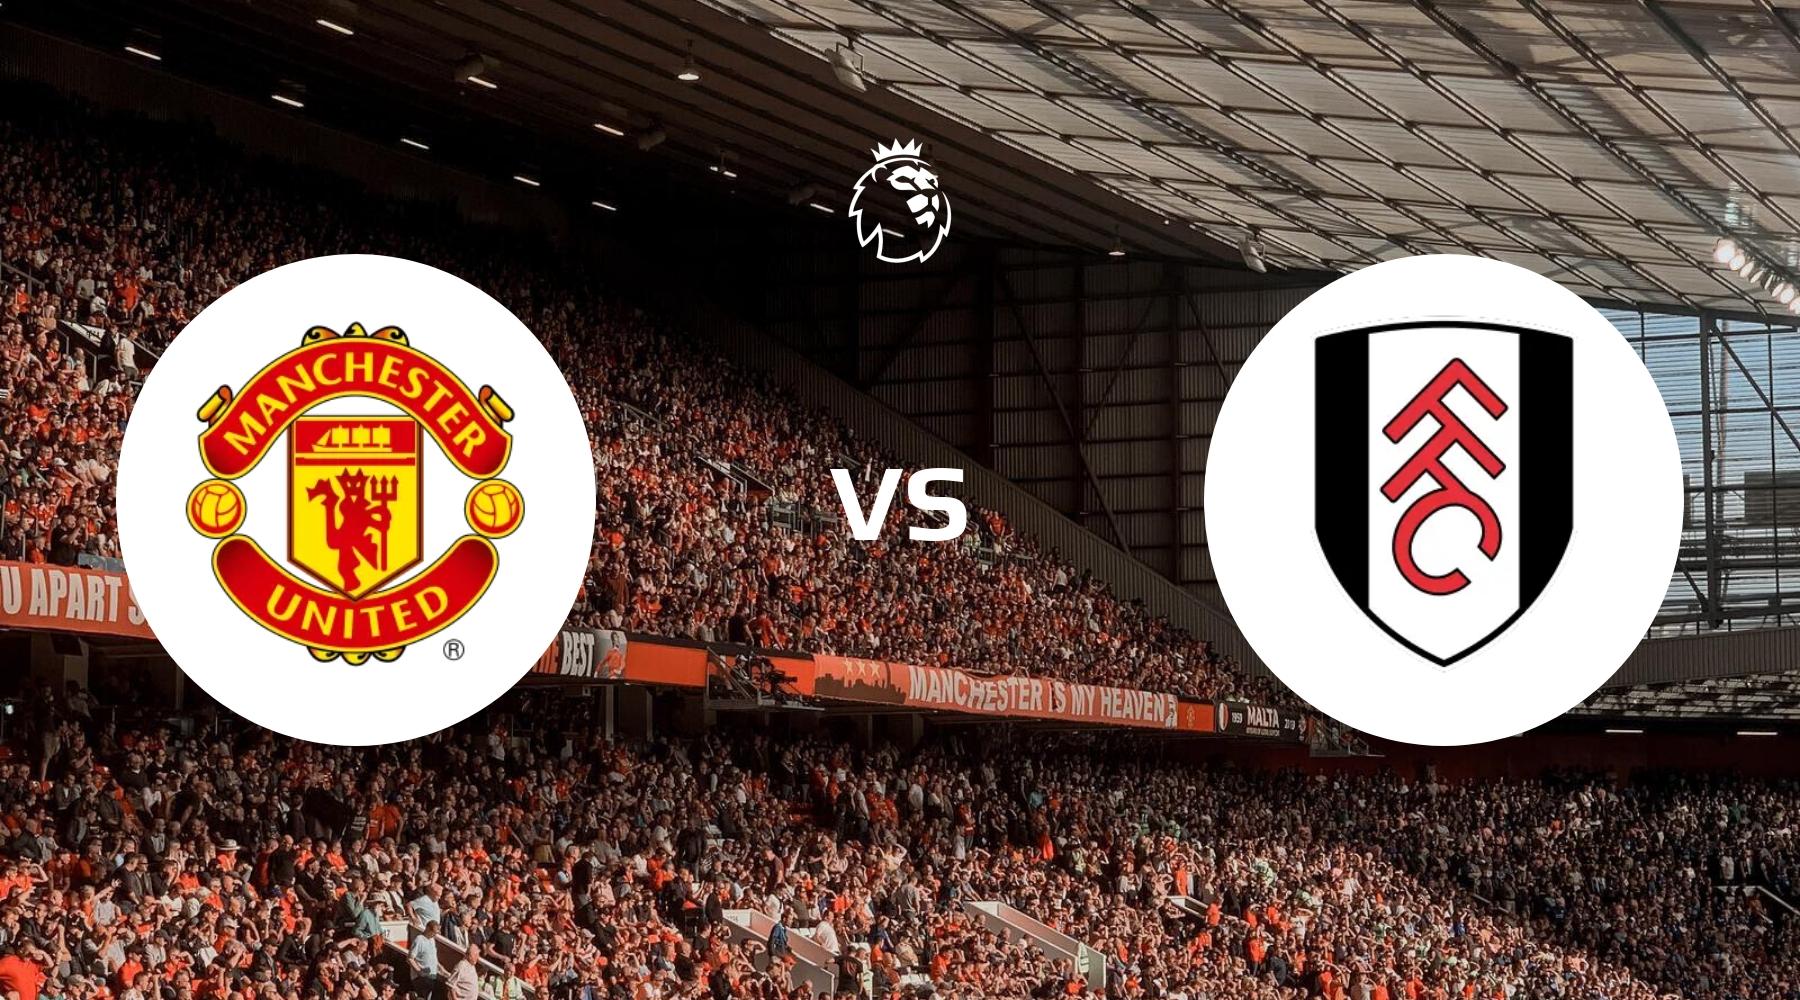 Manchester United - Fulham